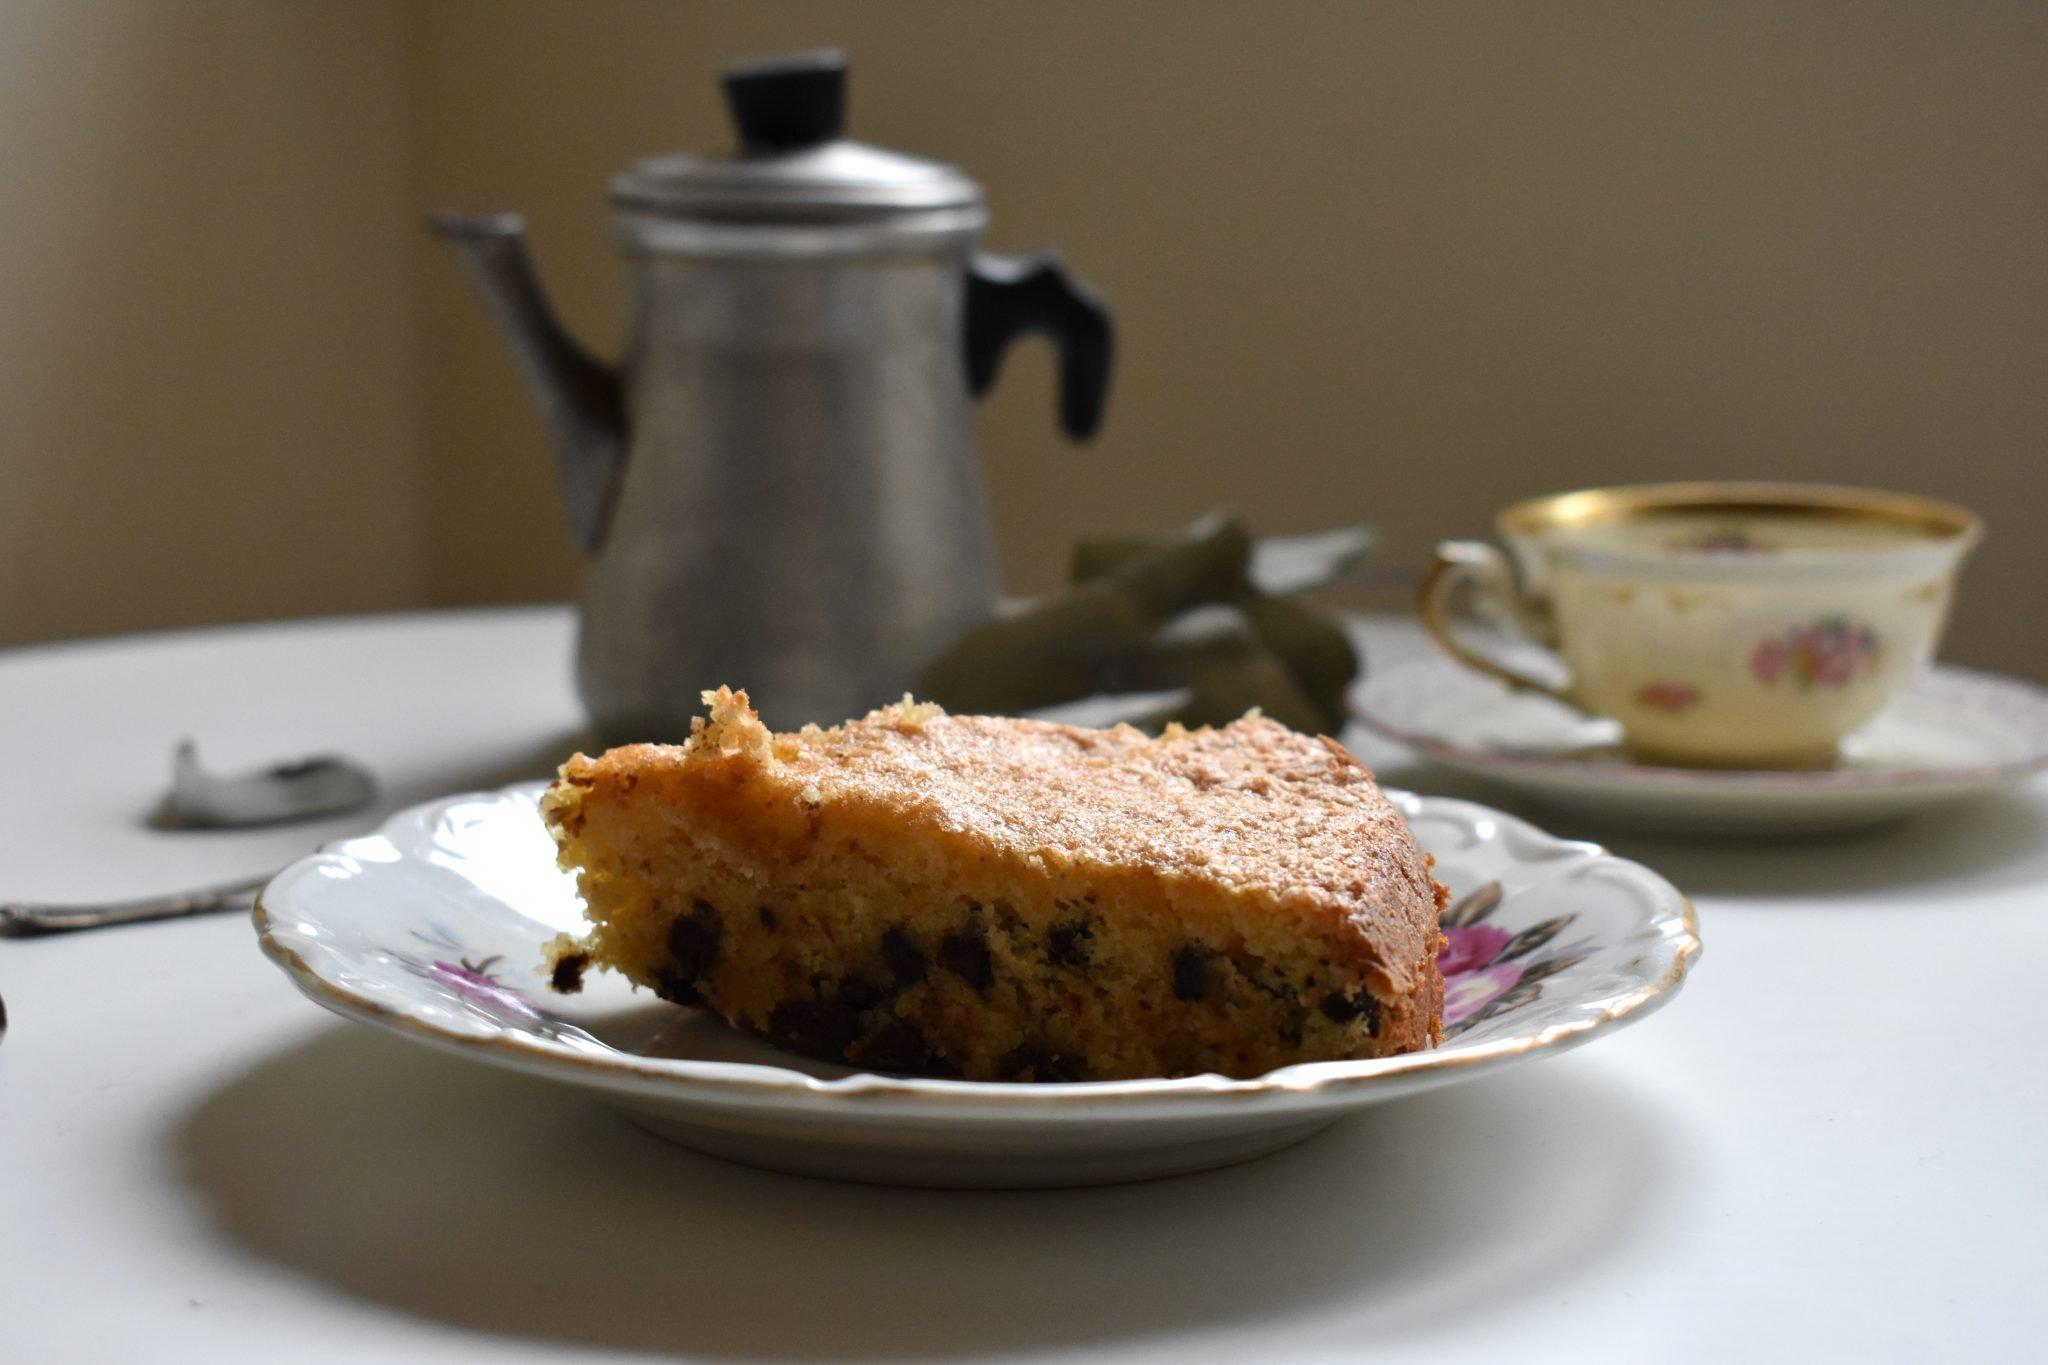 Torta nocciole e mandorle 2 - Le Plume